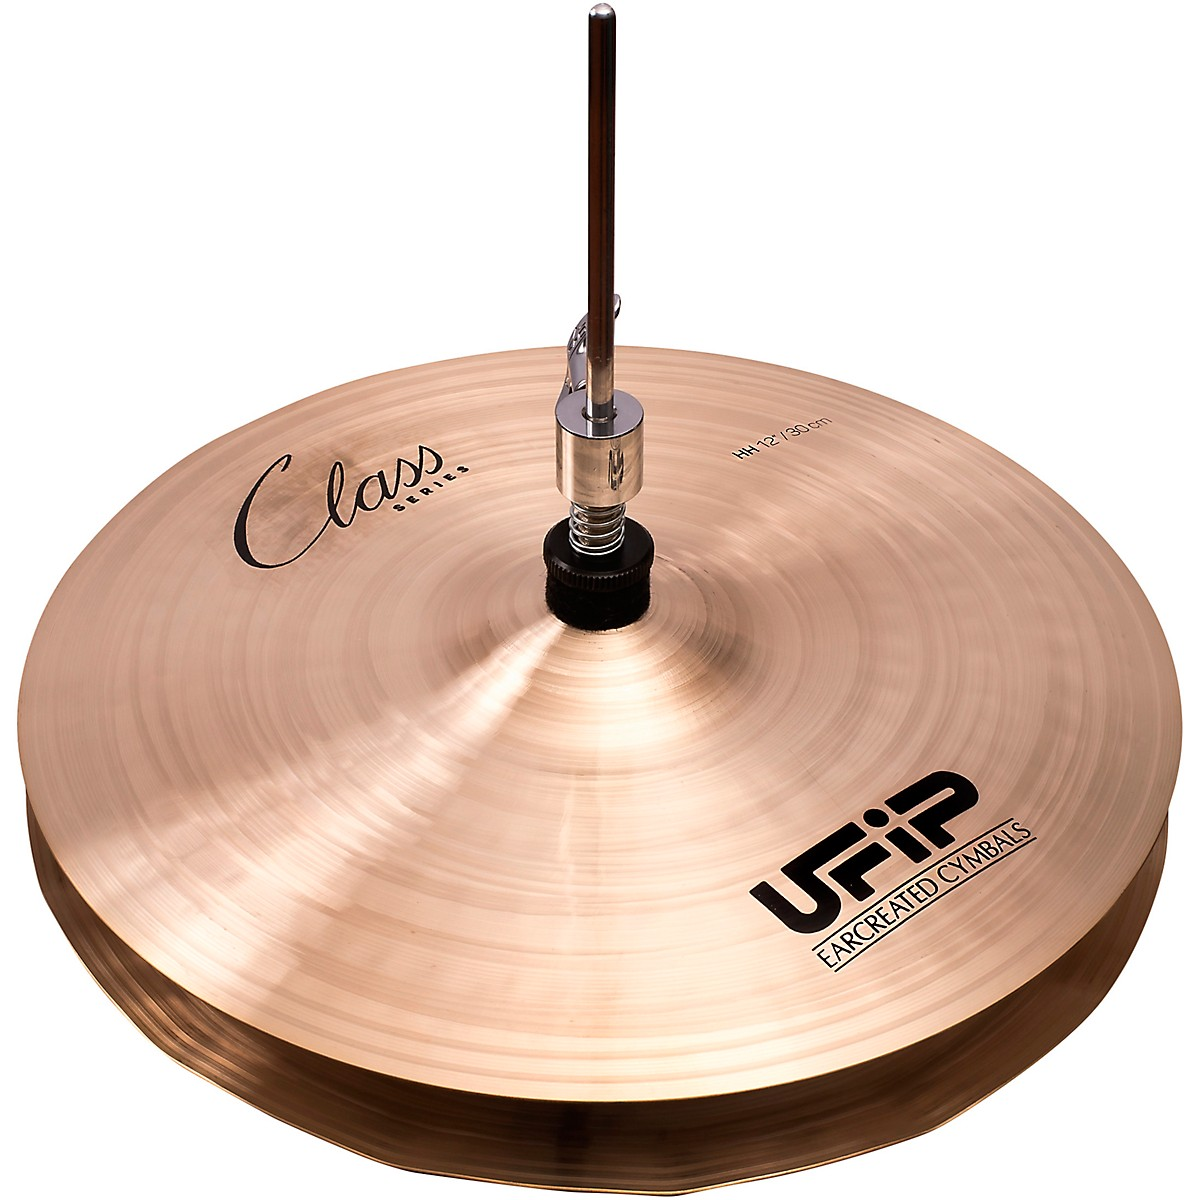 UFIP Class Series Wave Hi-Hat Cymbal Pair